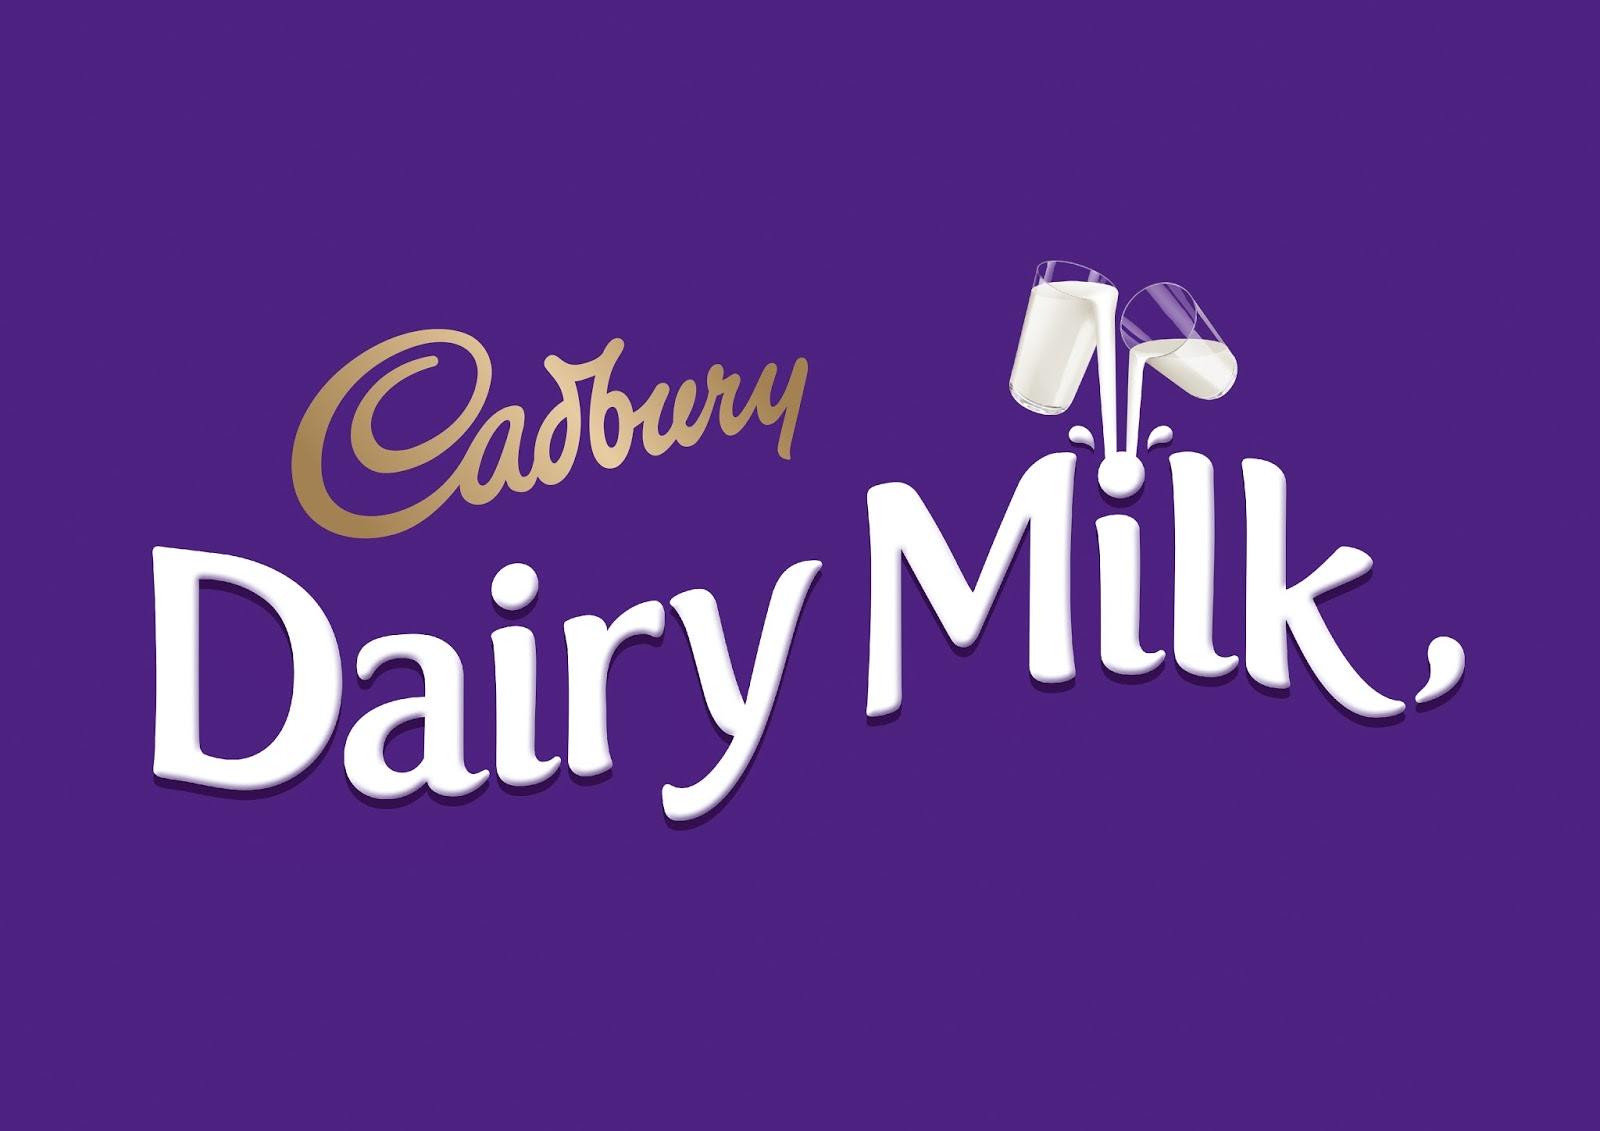 company on cadbury Marketing strategy of cadbury - cadbury marketing strategy  while cadbury's parent company mondelez international is the world leader in bars & chocolates for.